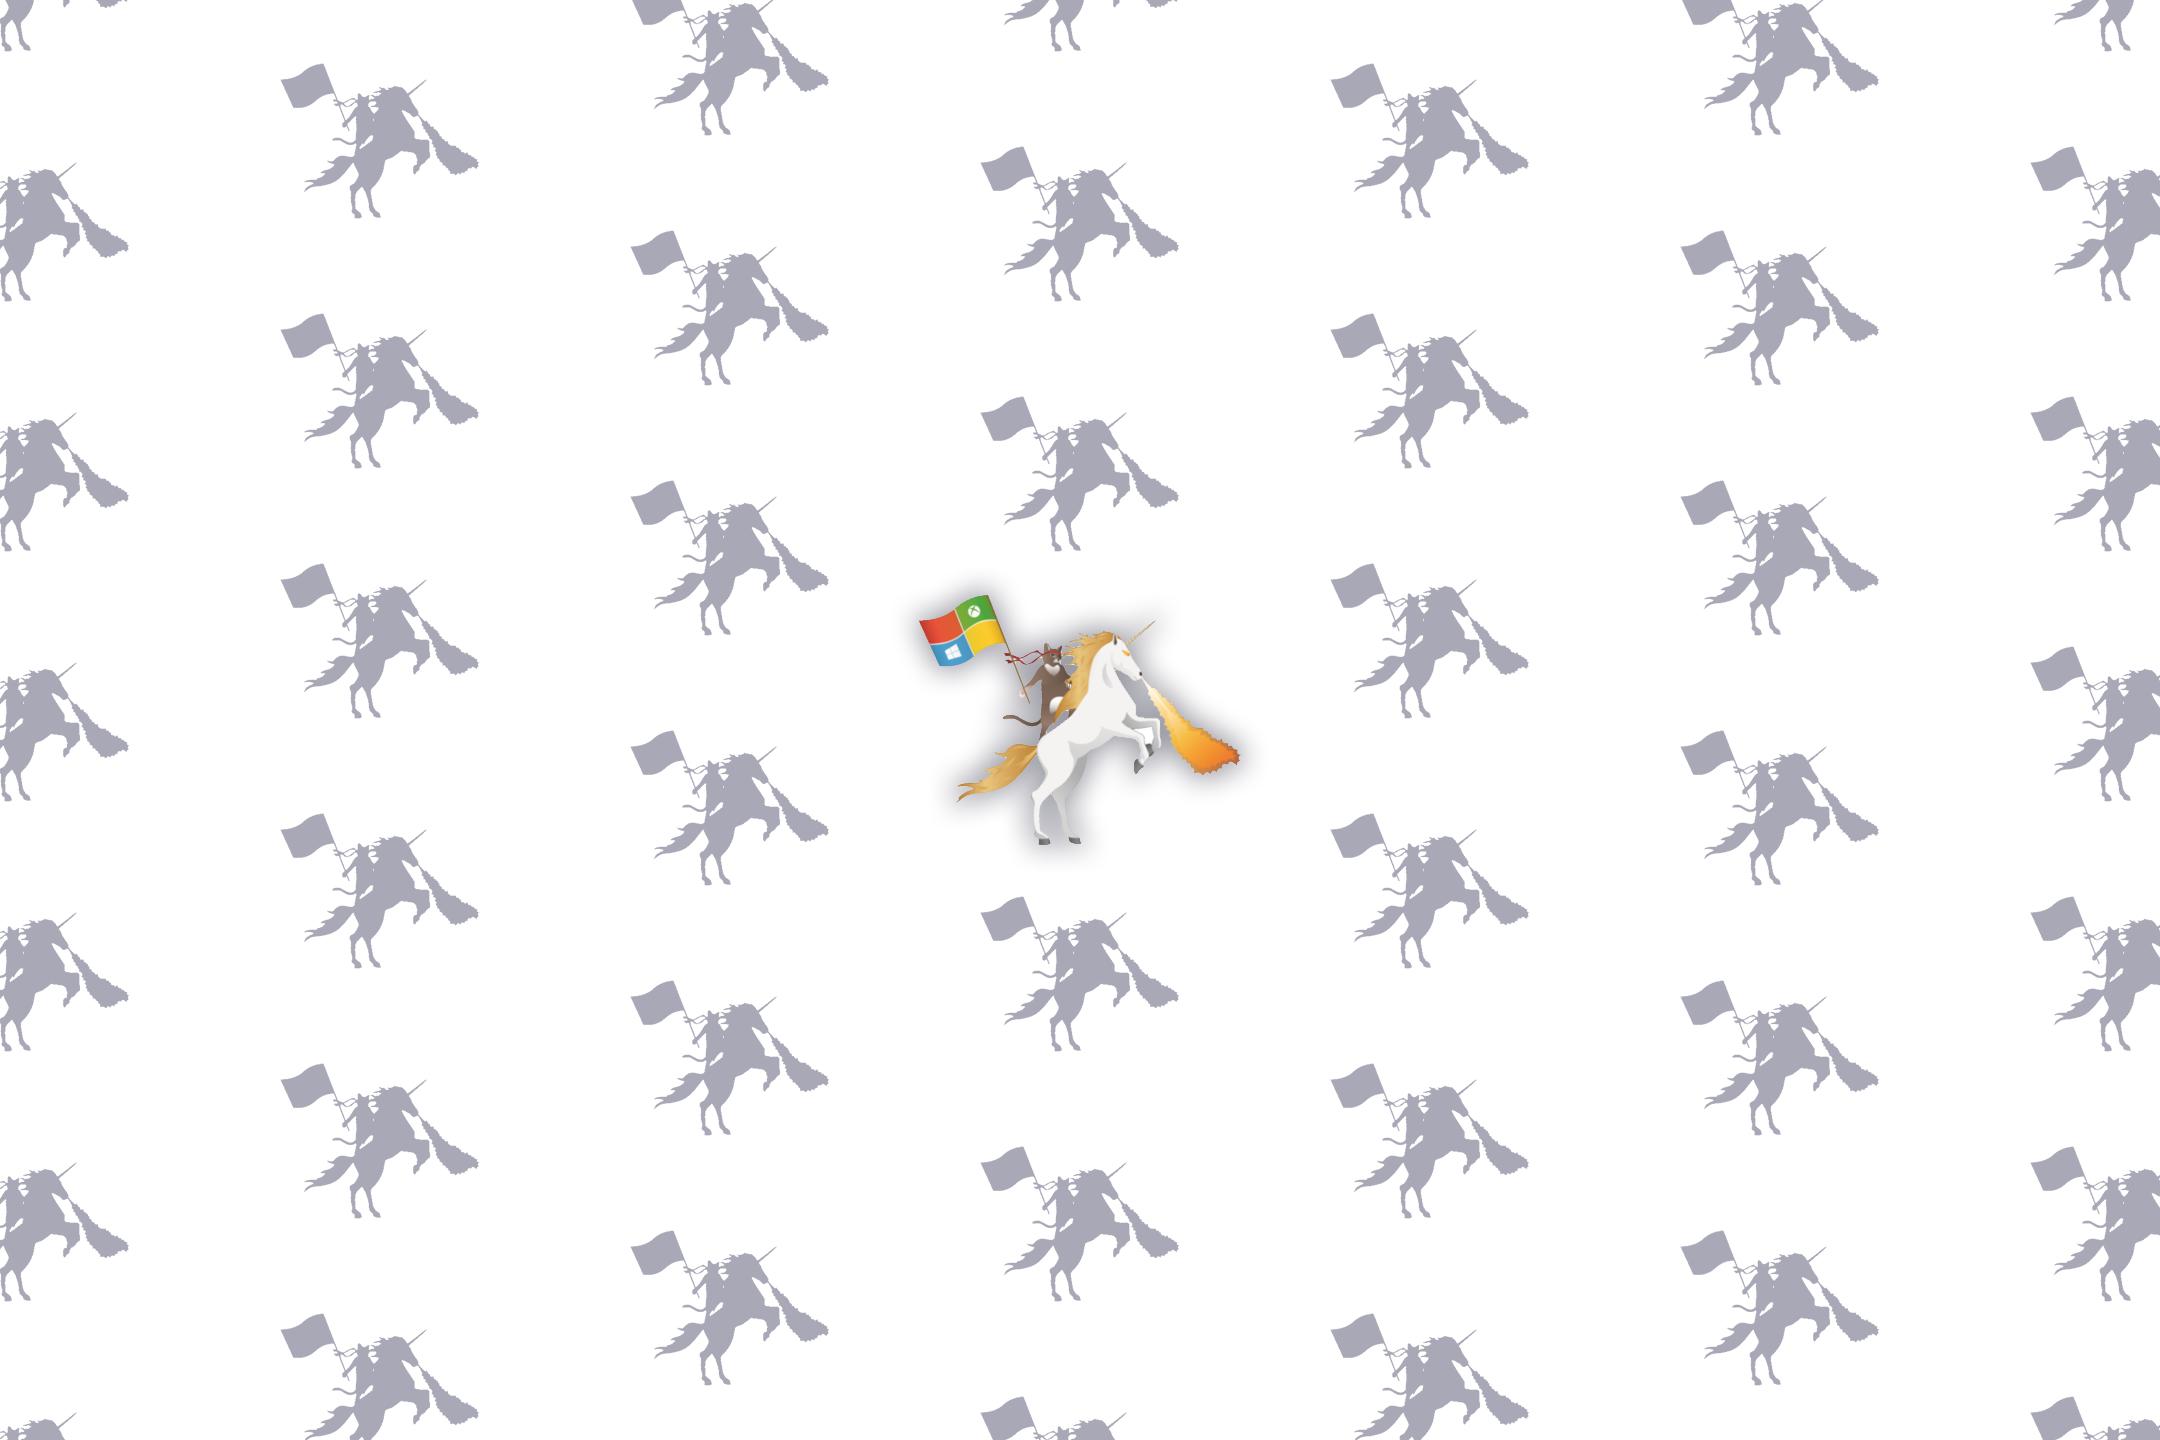 Ninja Cat riding a Unicorn Wallpapers by MichaelGillett   Piptell 2160x1440